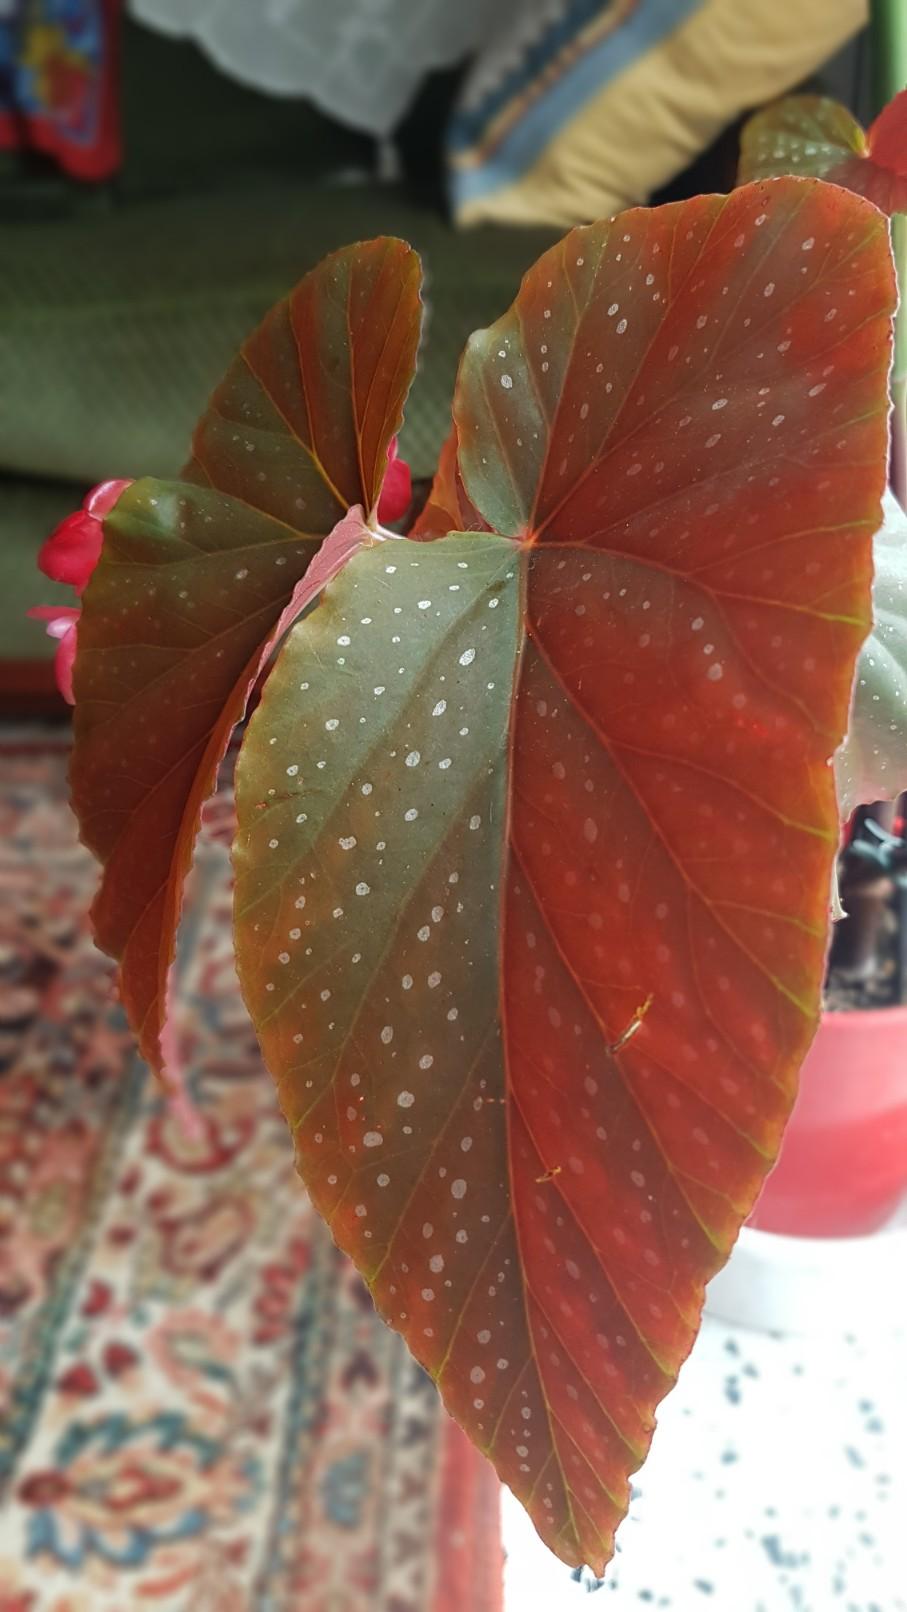 Begonia maculata et horticoles - bégonia bambou 20181173